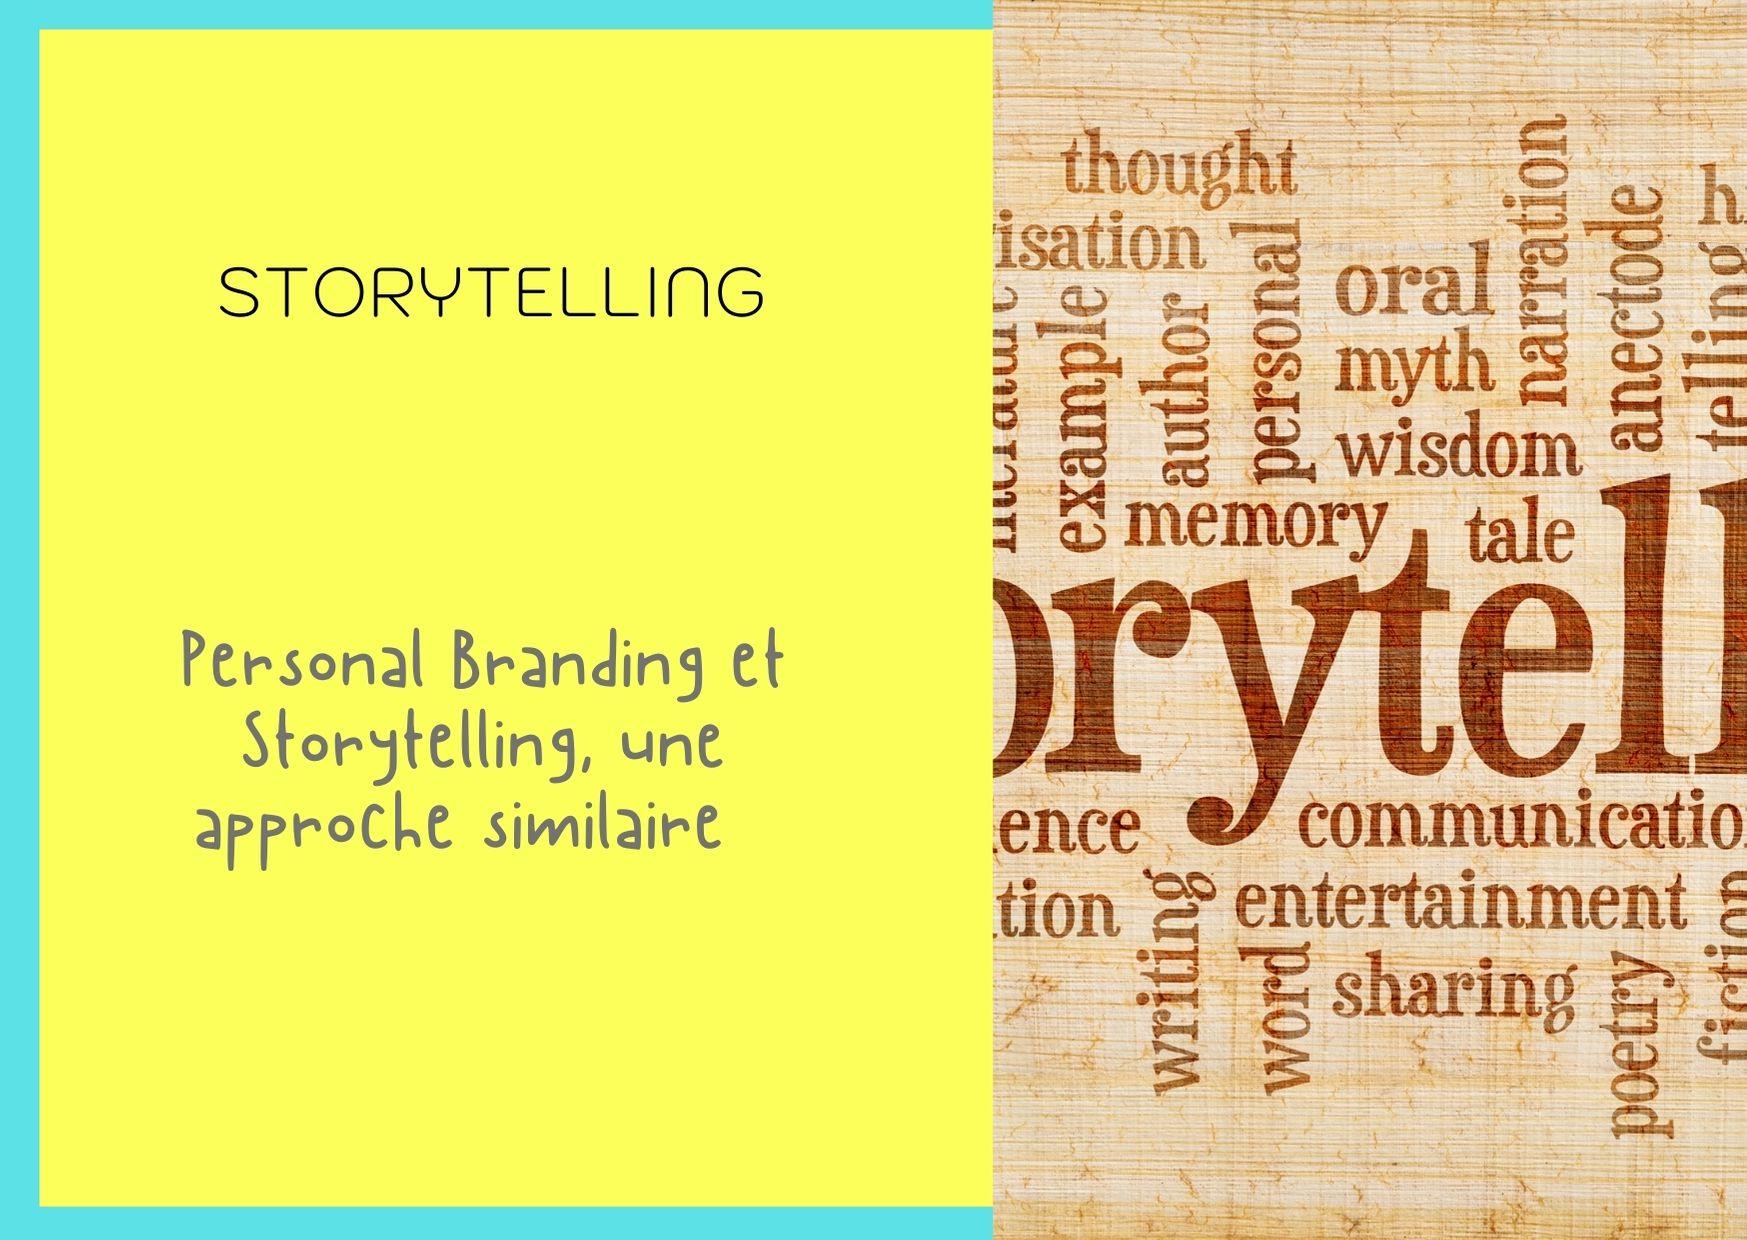 storytelling_personal_branding